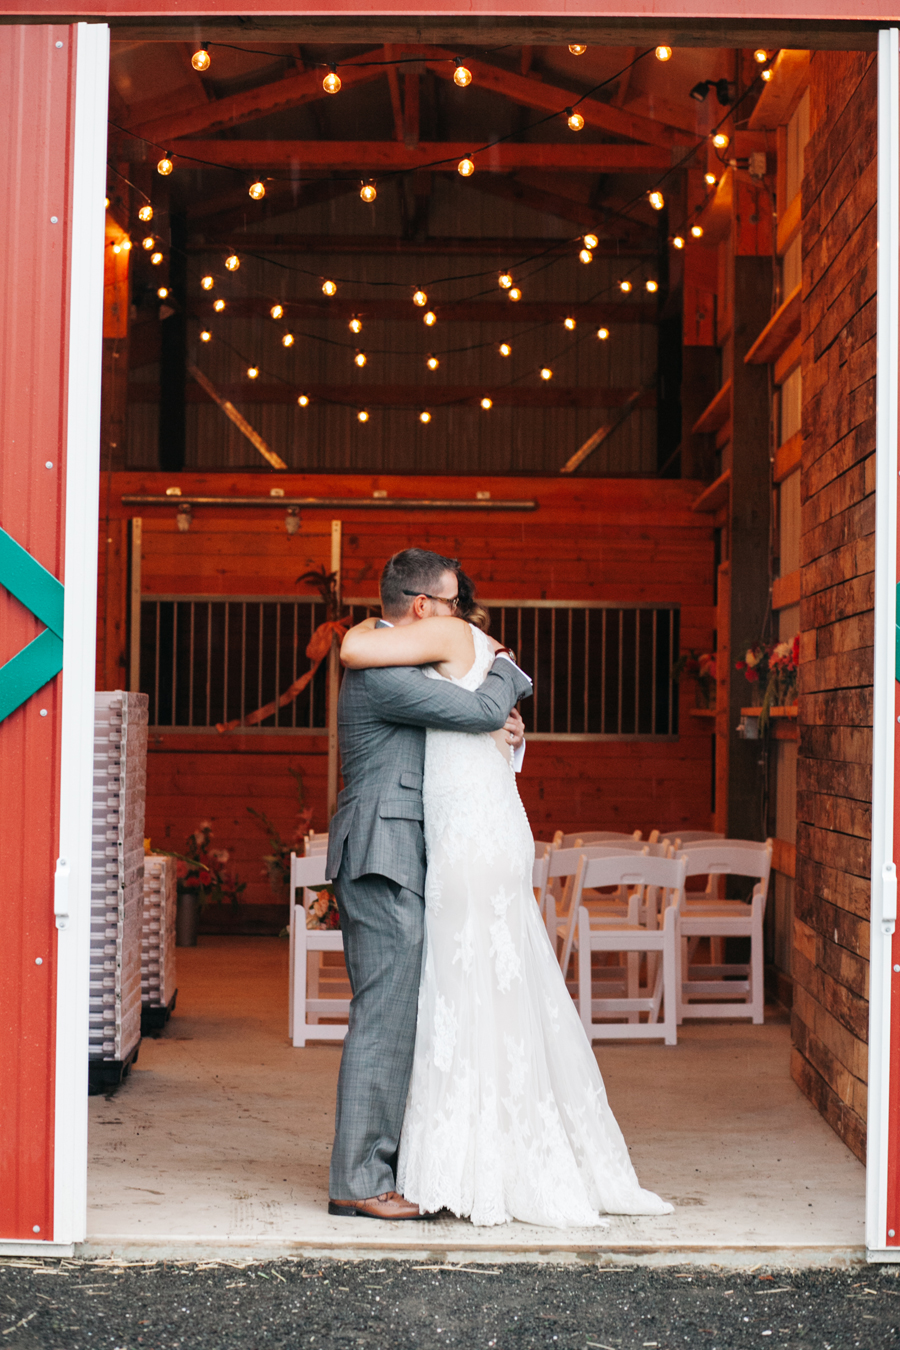 017-bellingham-wedding-photographer-katheryn-moran-photography-farm-kitchen.jpg